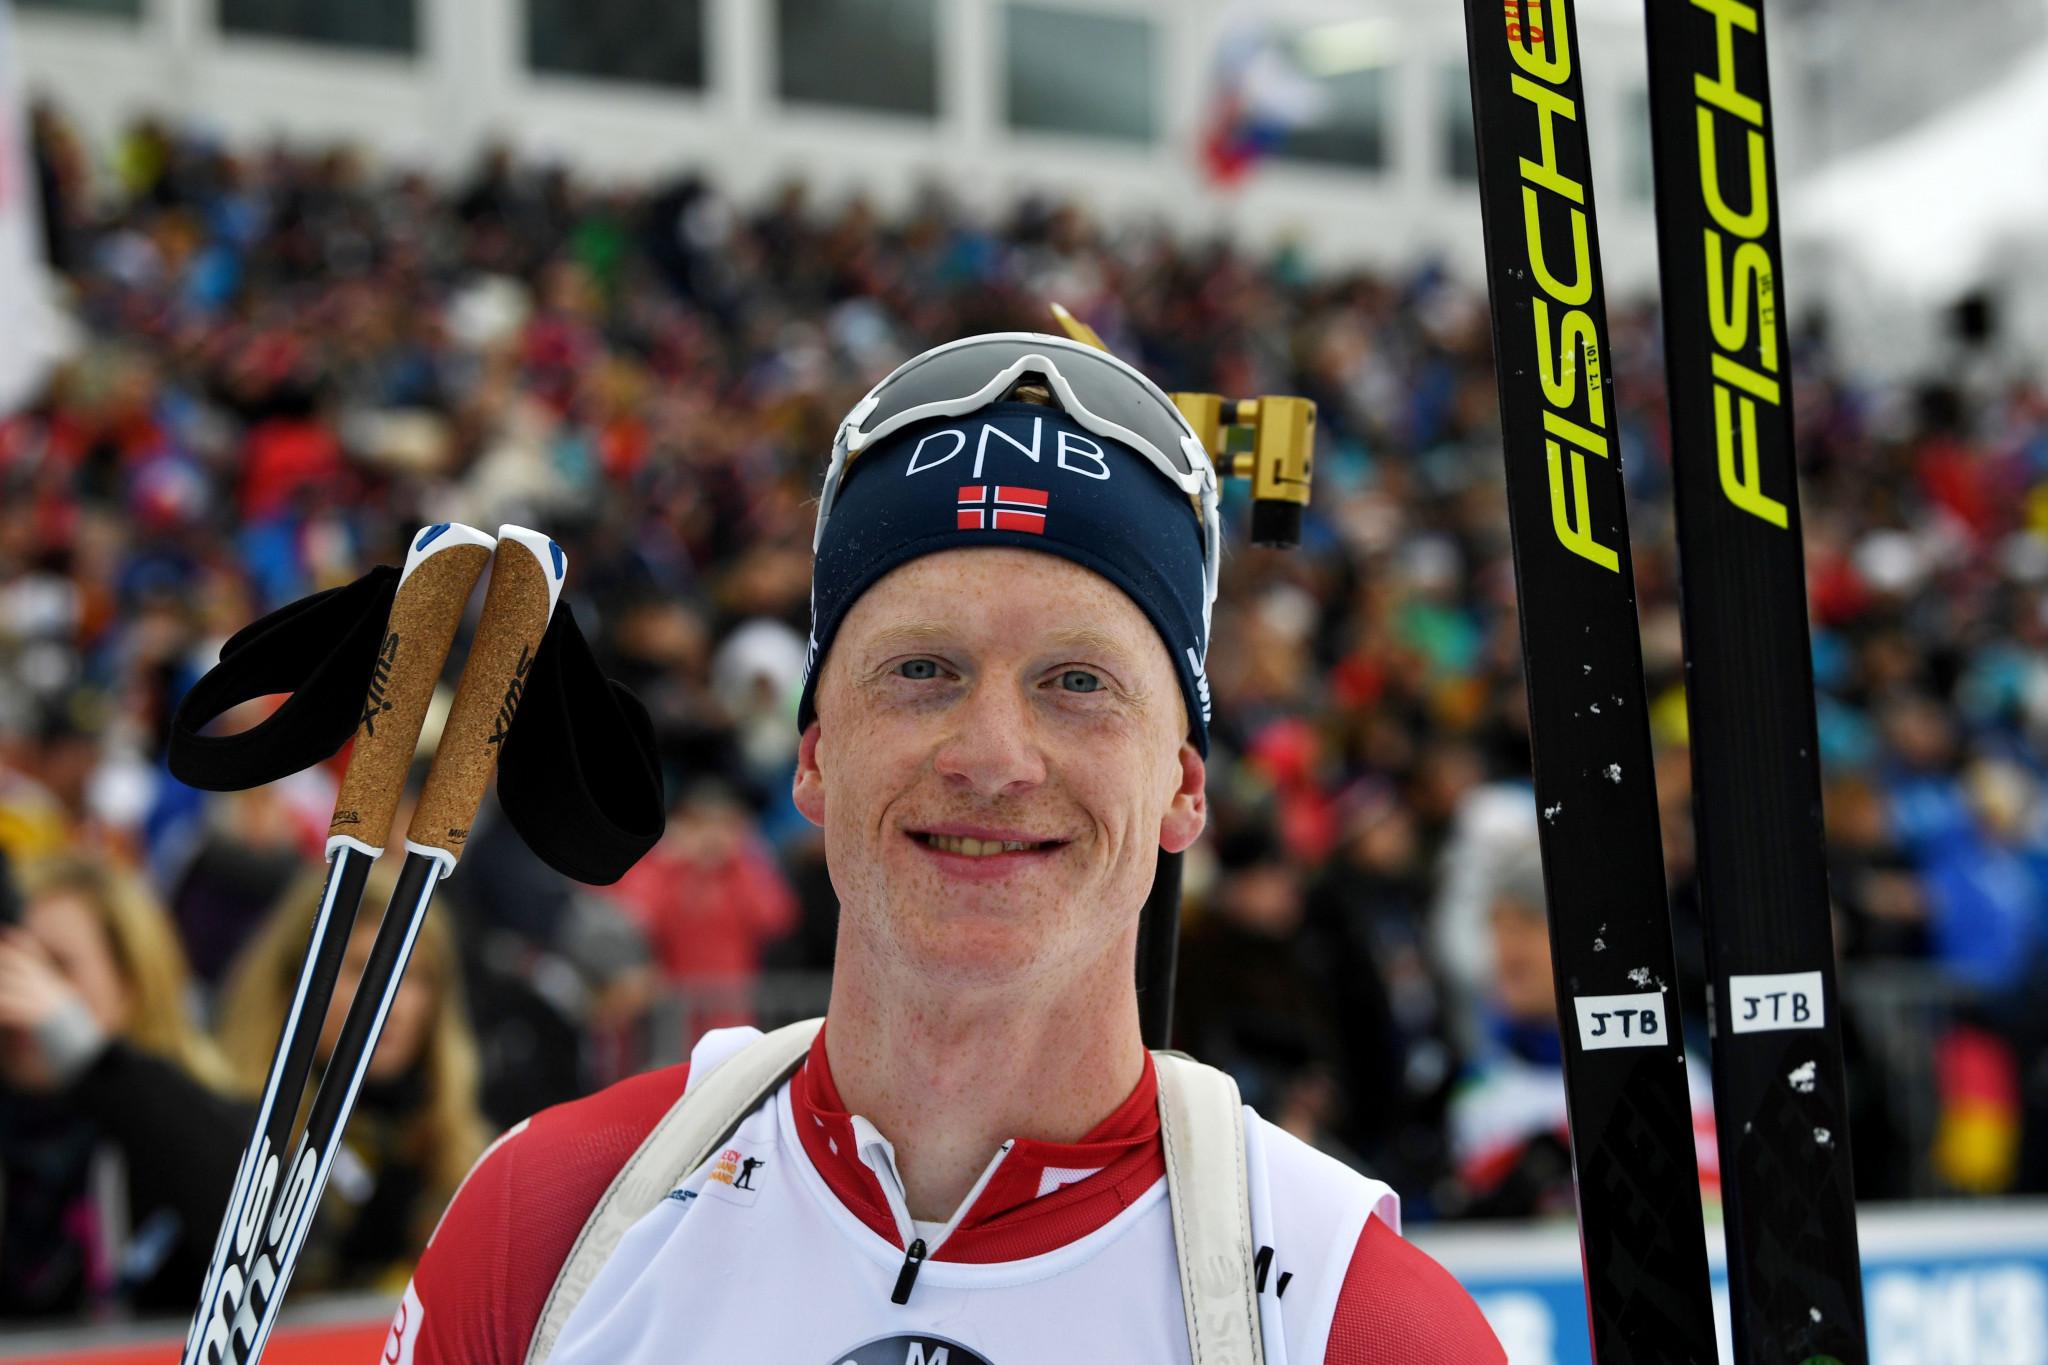 Bø tops men's 10km sprint podium at Biathlon World Cup in France